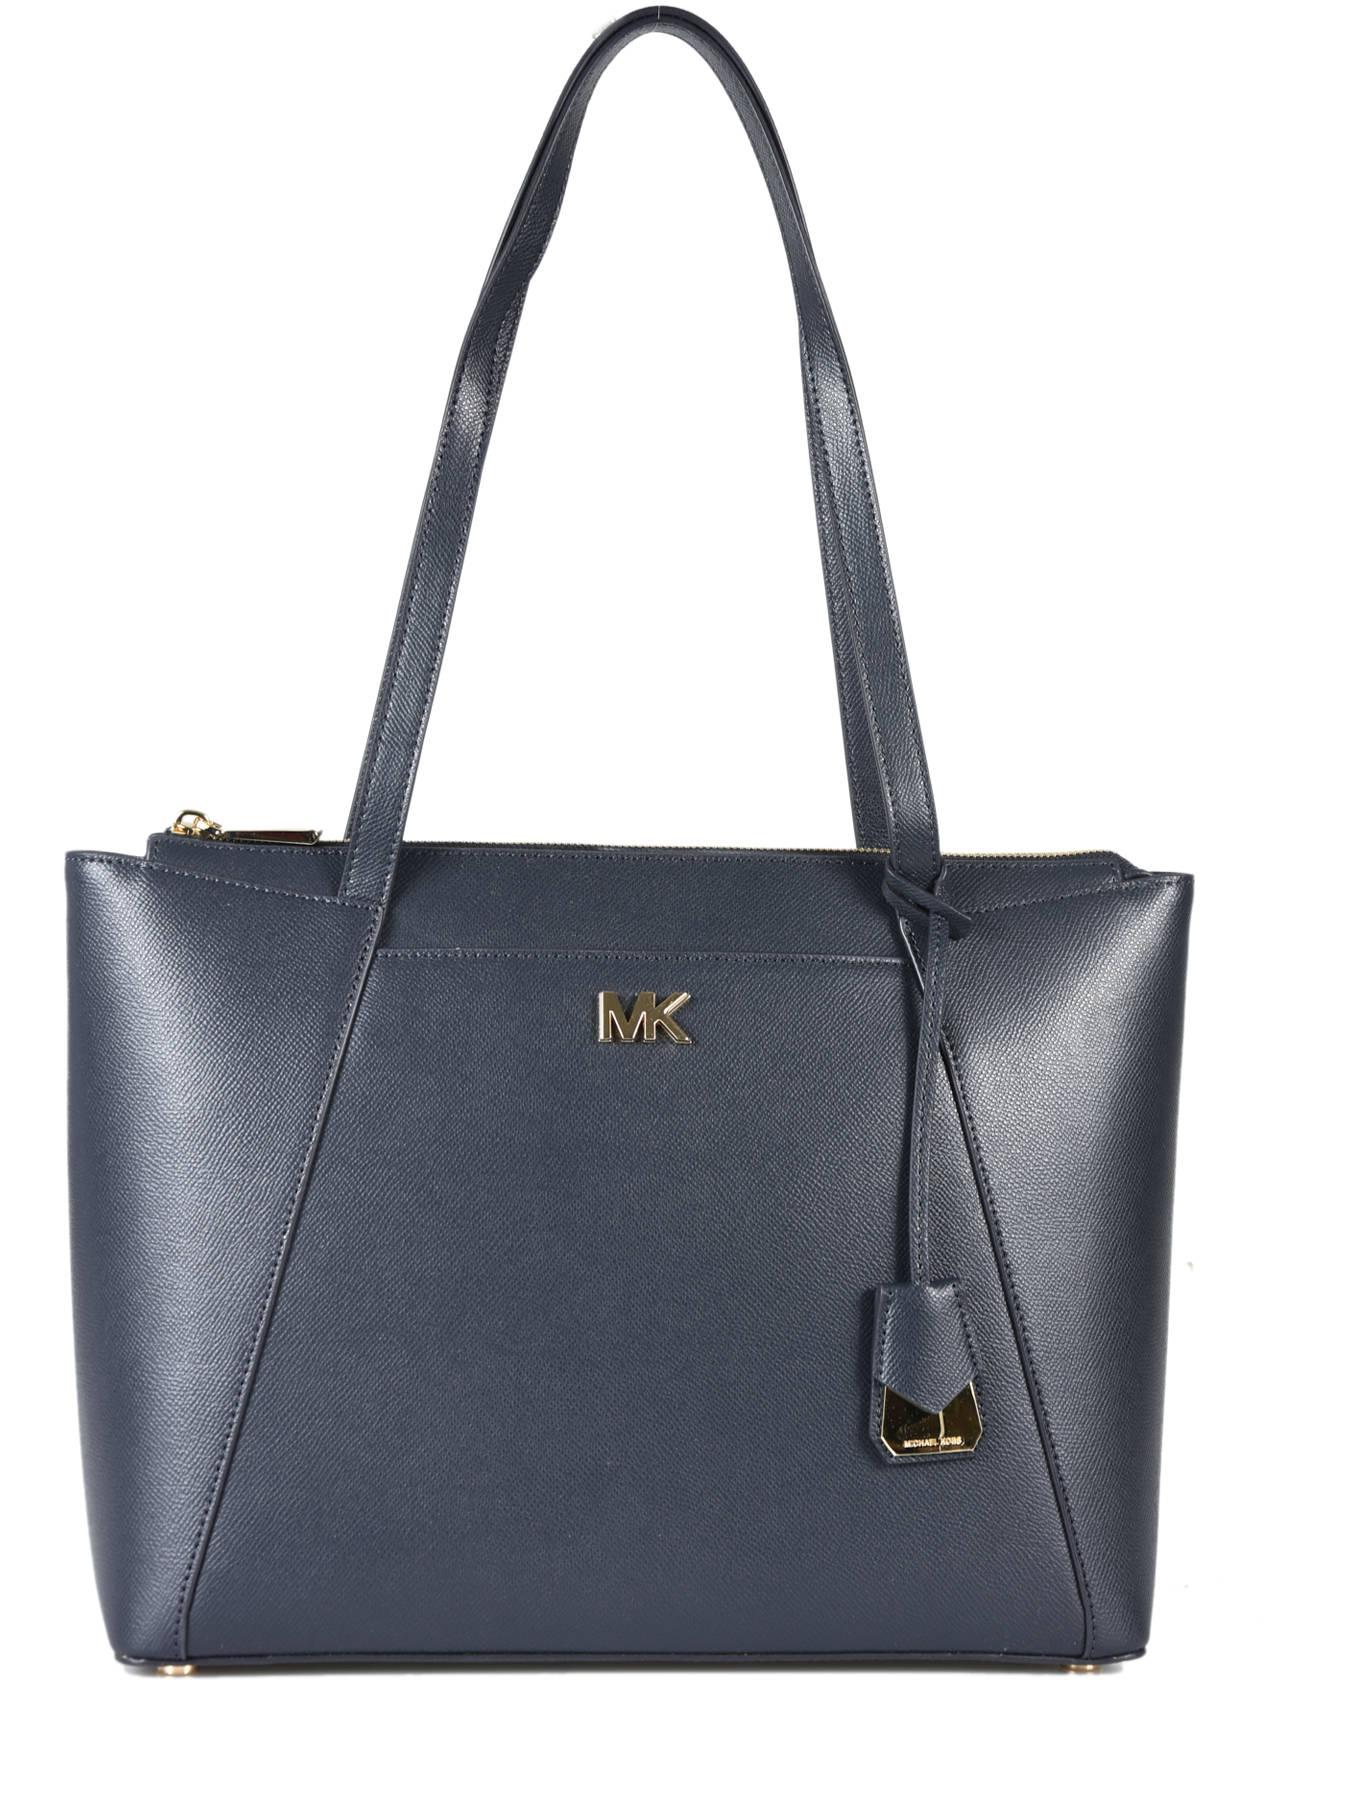 ... Shoulder Bag Maddie Leather Michael kors Blue maddie S8GN2T2L ... 90d2aa307dabc